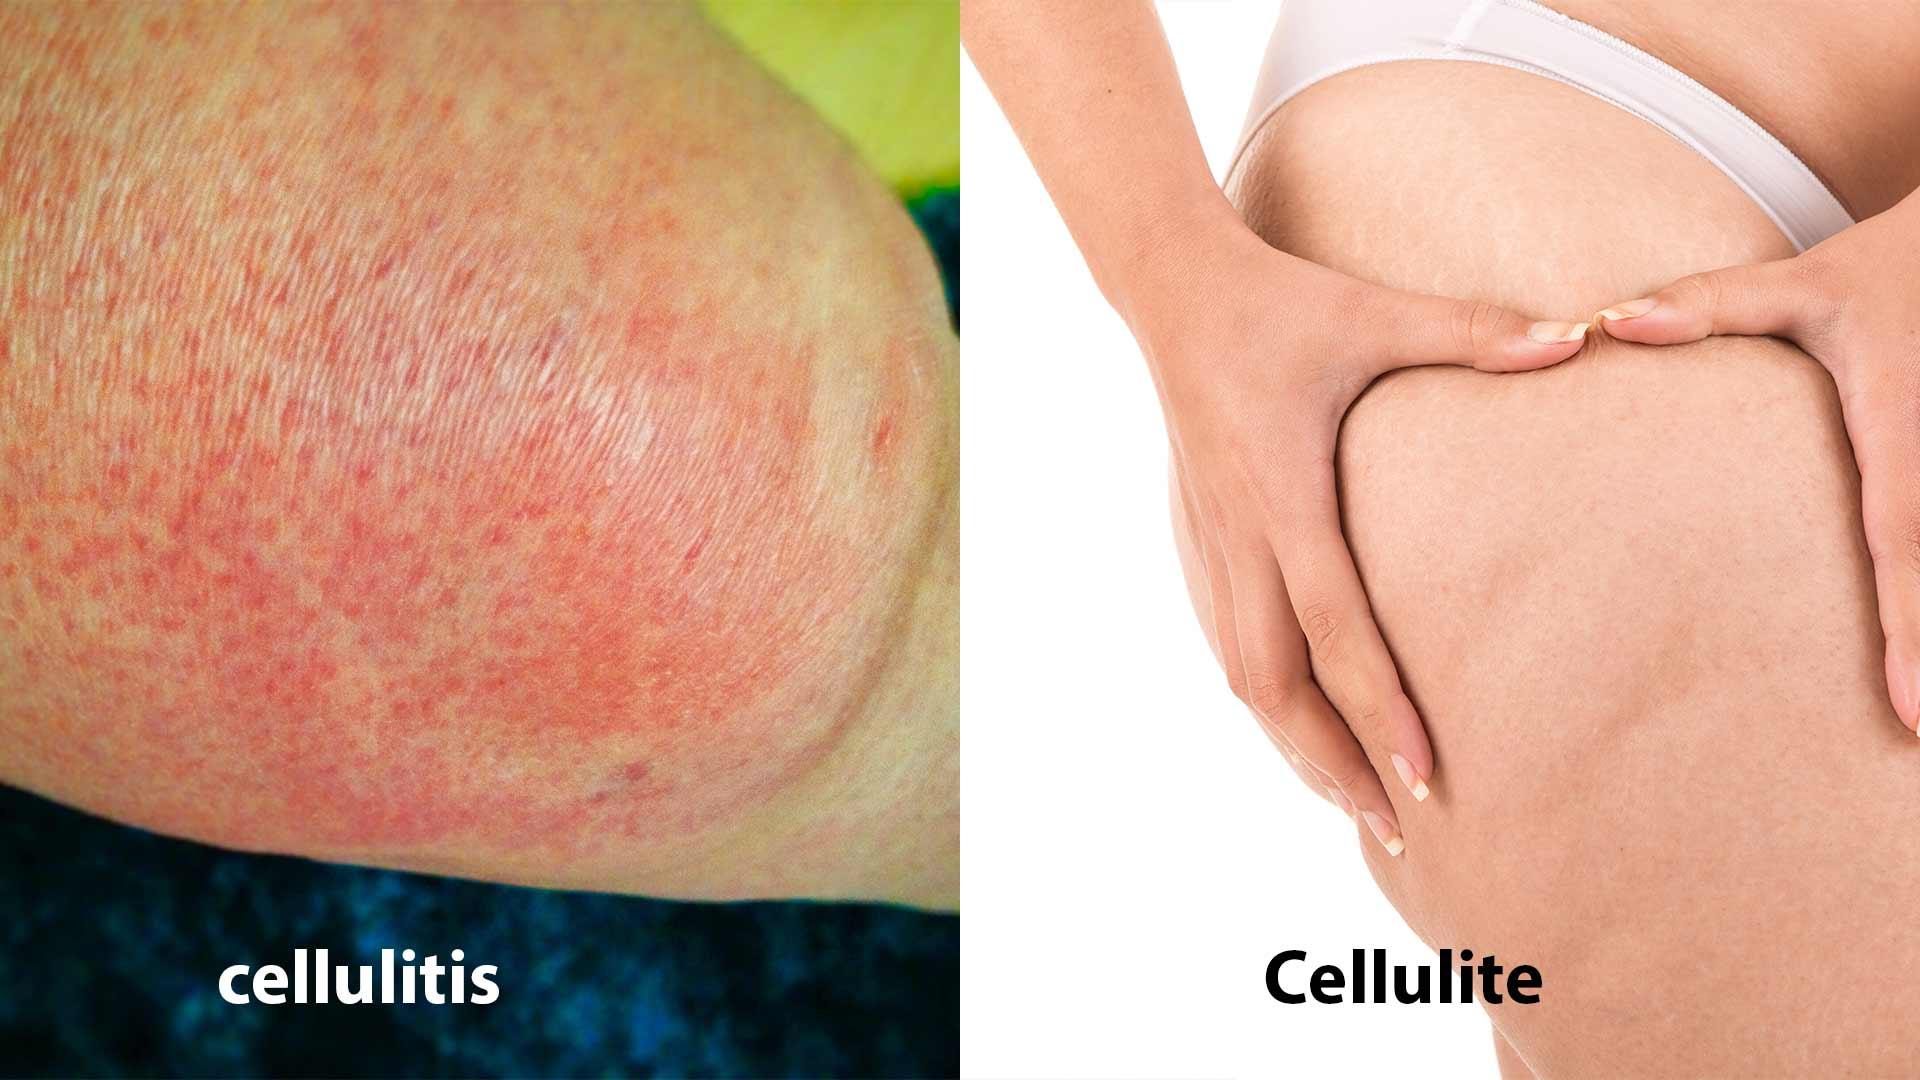 Cellulitis and Cellulite